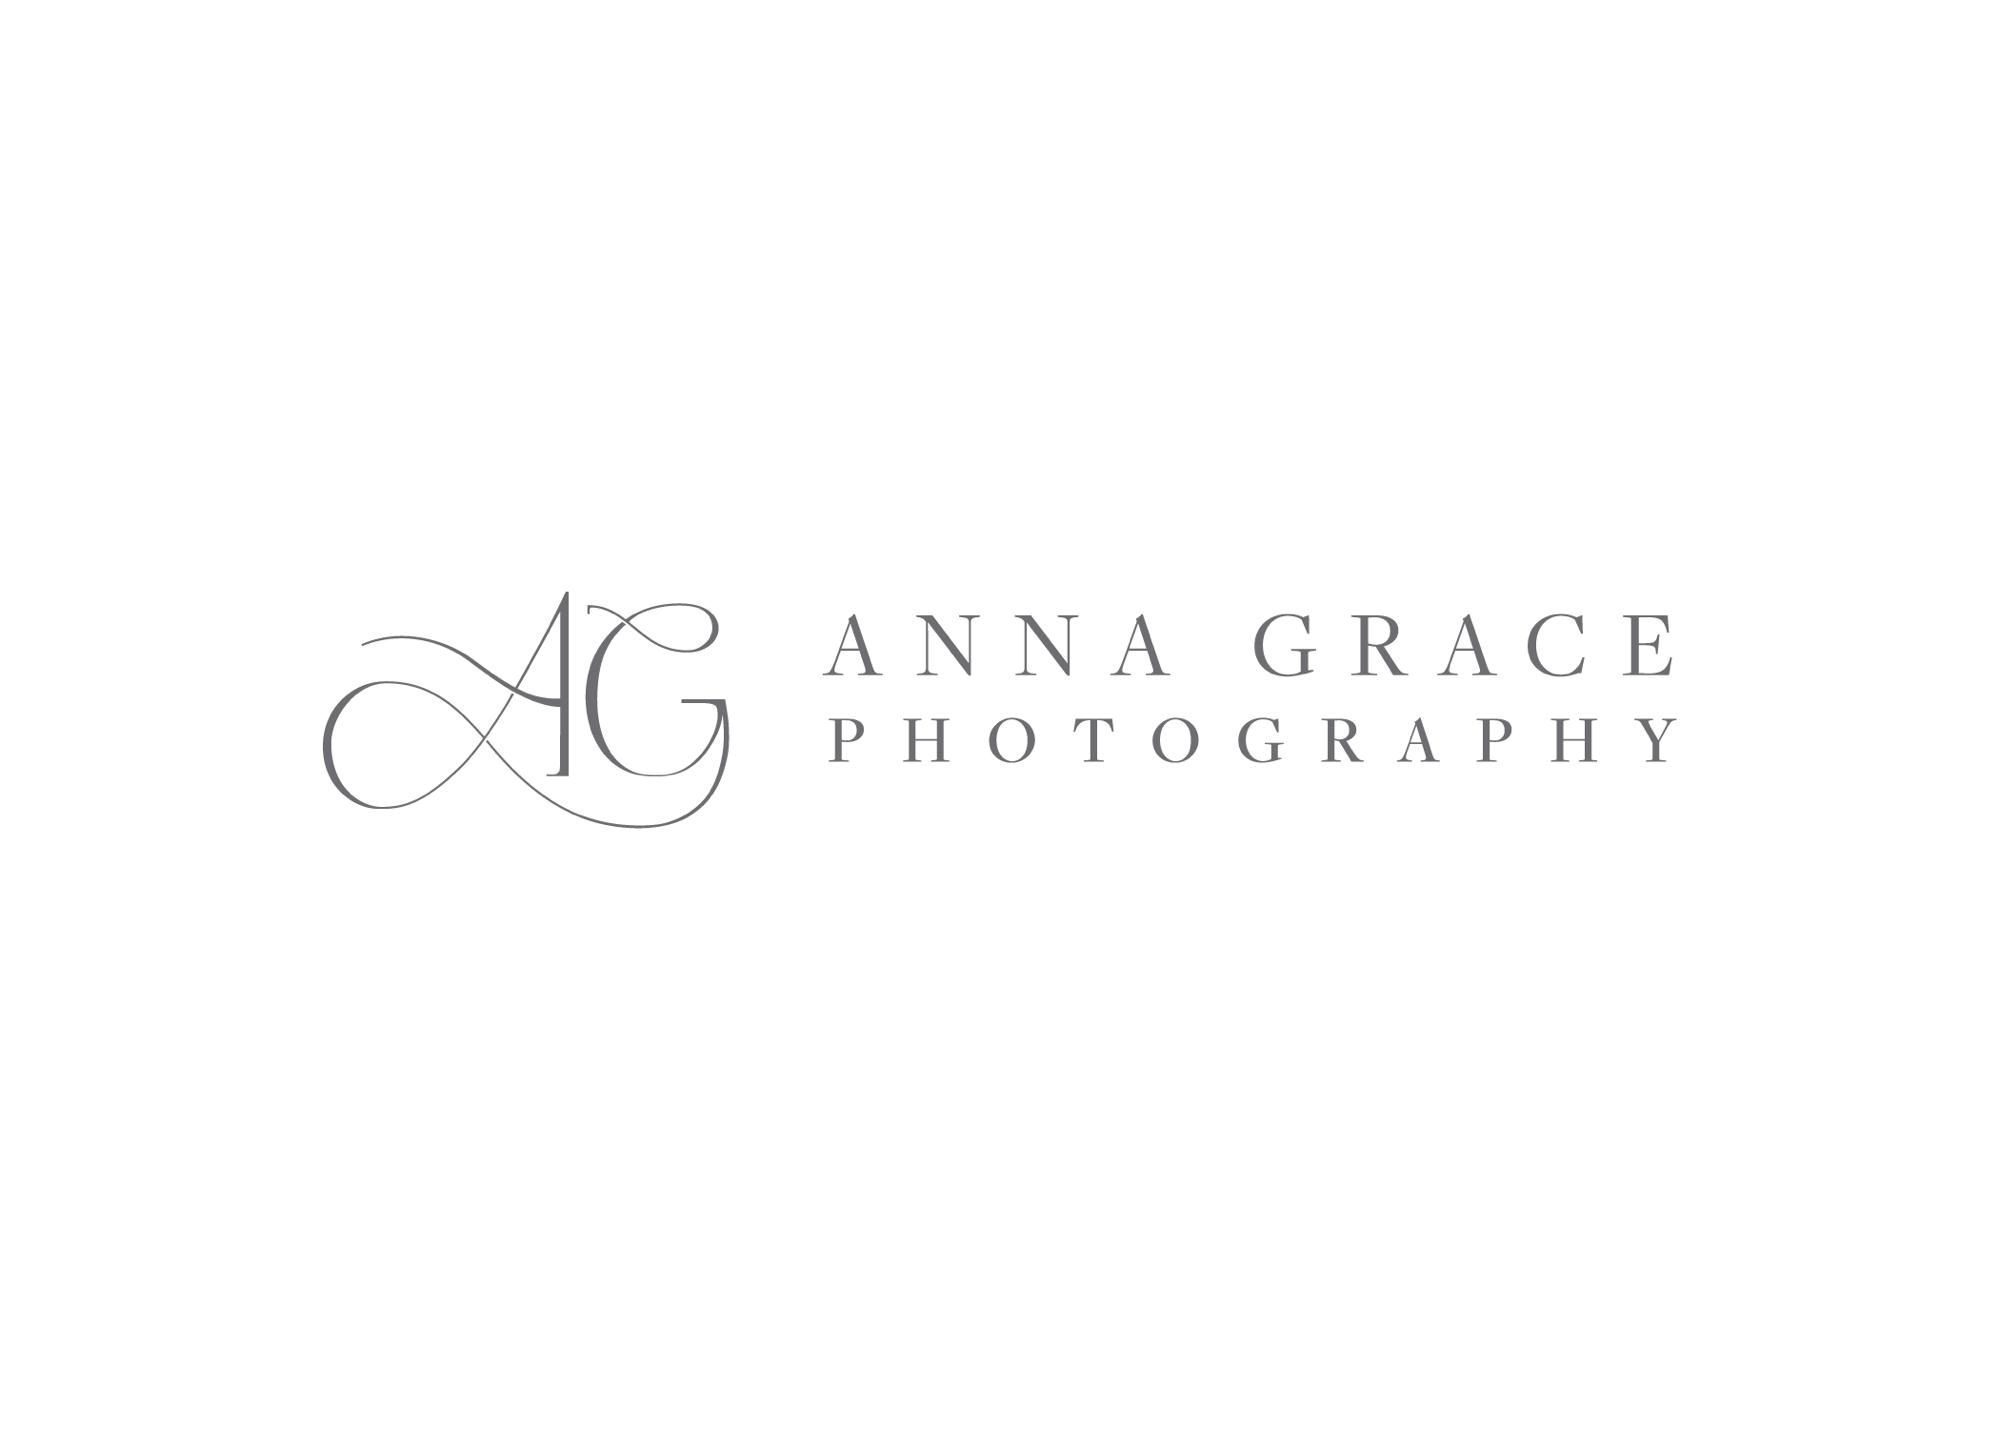 AGP Logo Concepts PB&J ROUND2-01_anna grace photography maryland newborn photographer photo.jpg